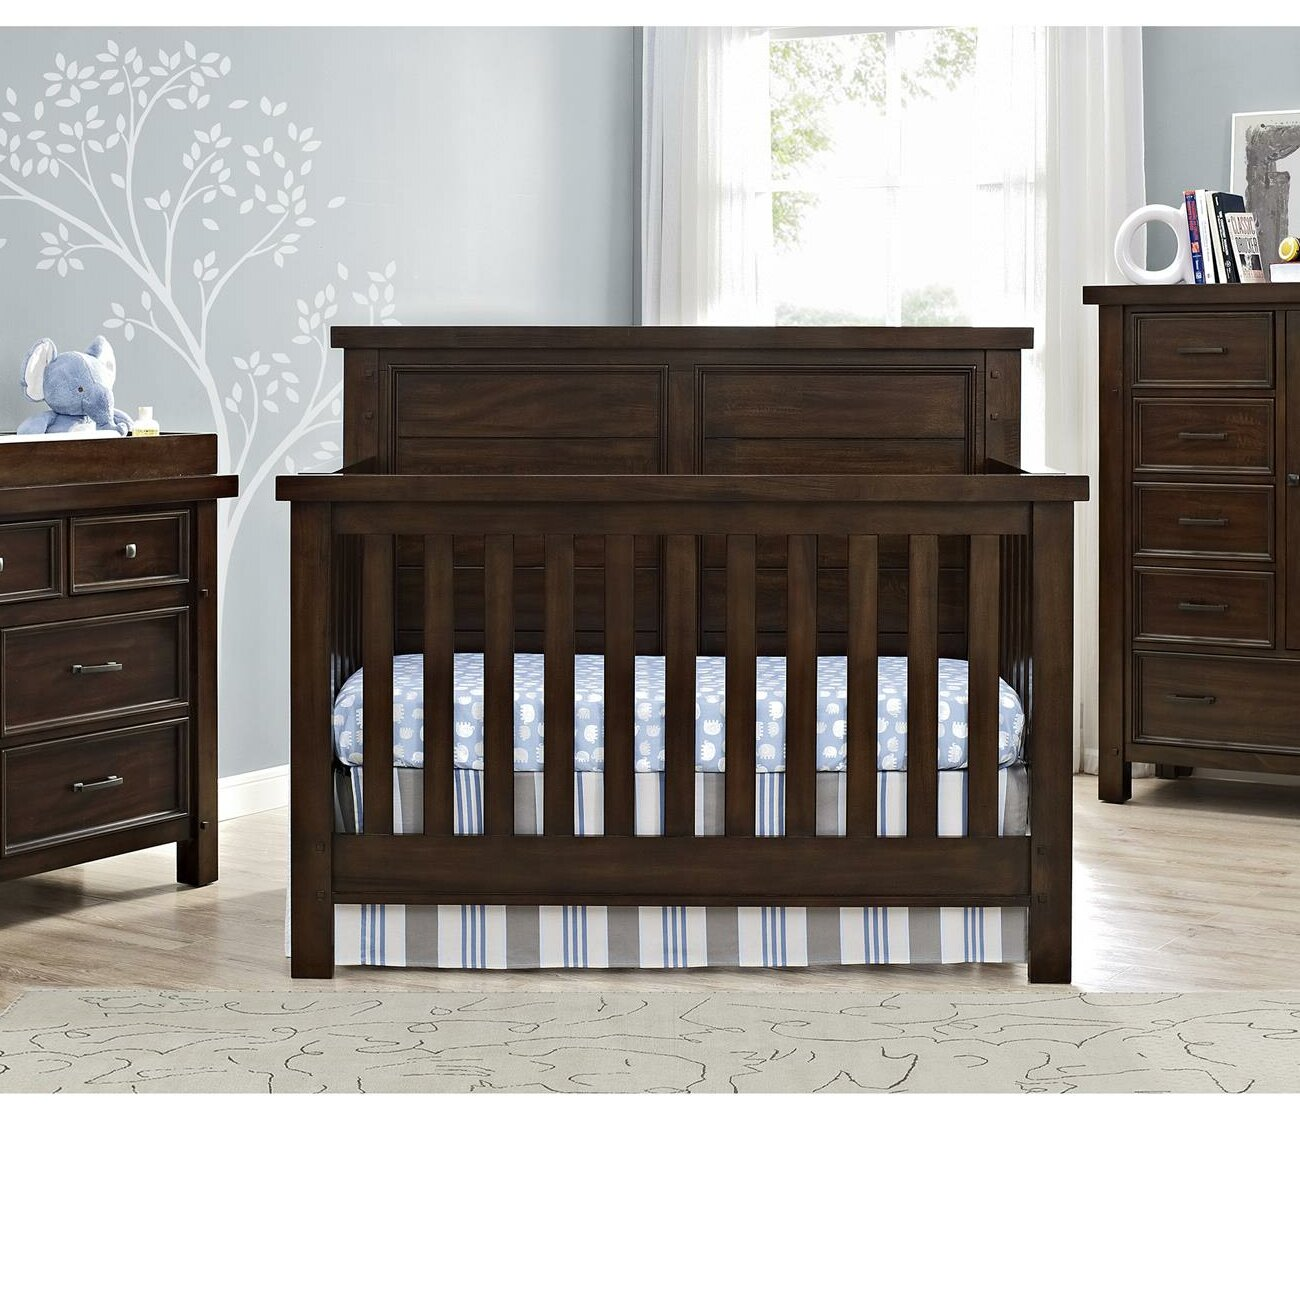 Wayfair   Brown & White Cribs You'll Love in 21